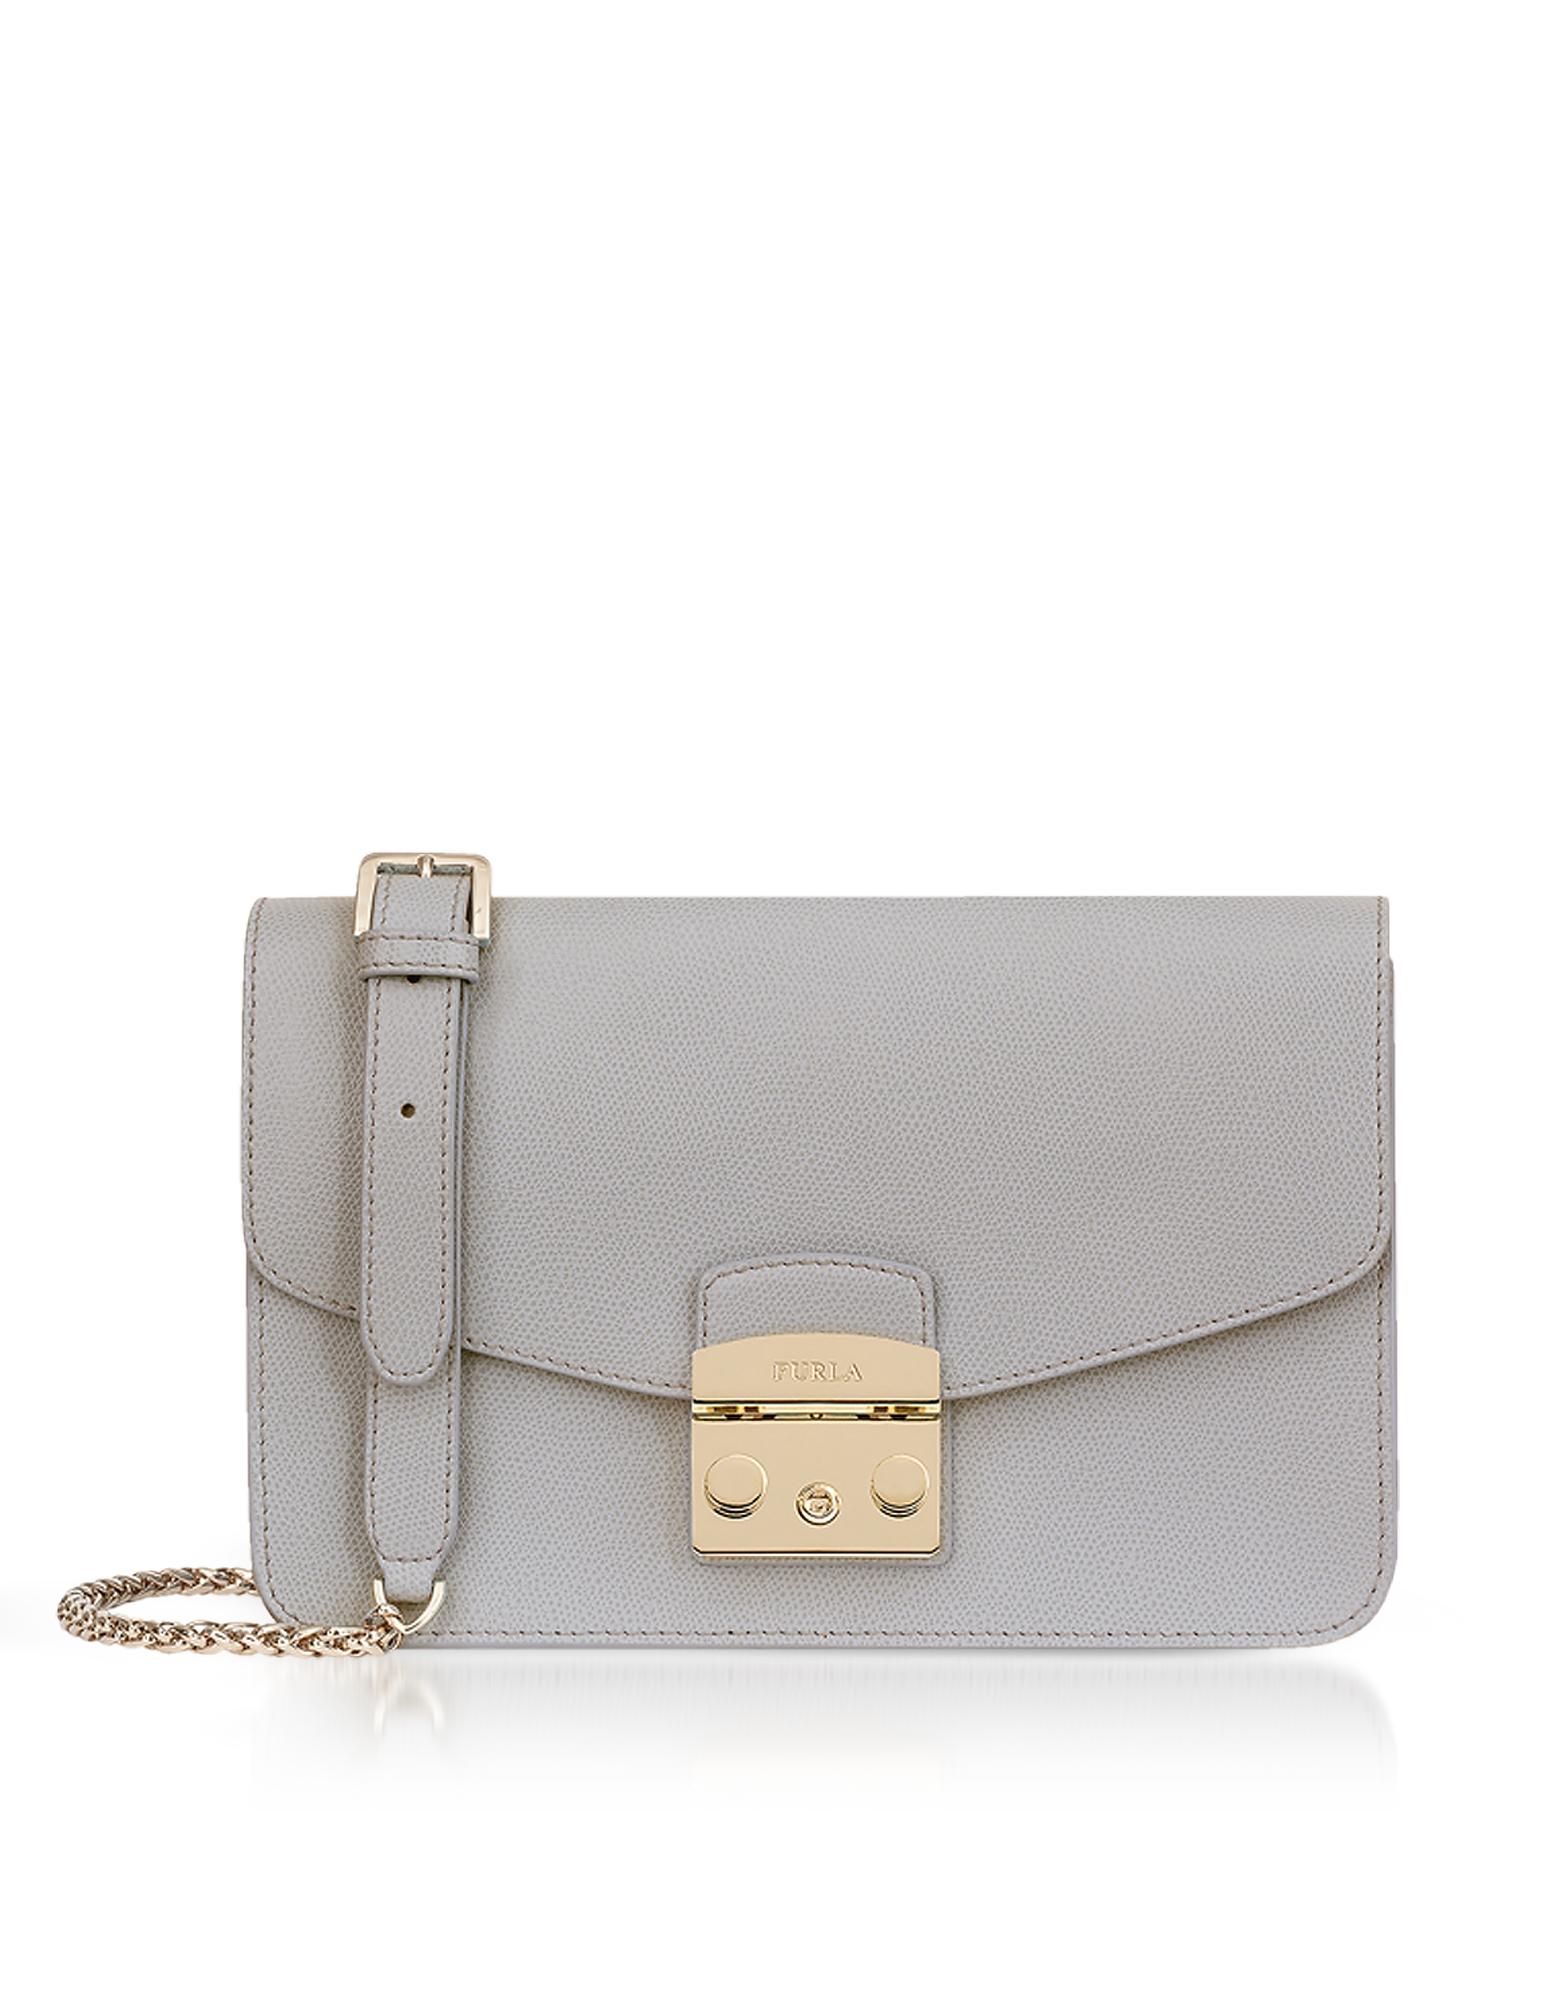 Furla Handbags, Genuine Leather Metropolis Small Shoulder Bag